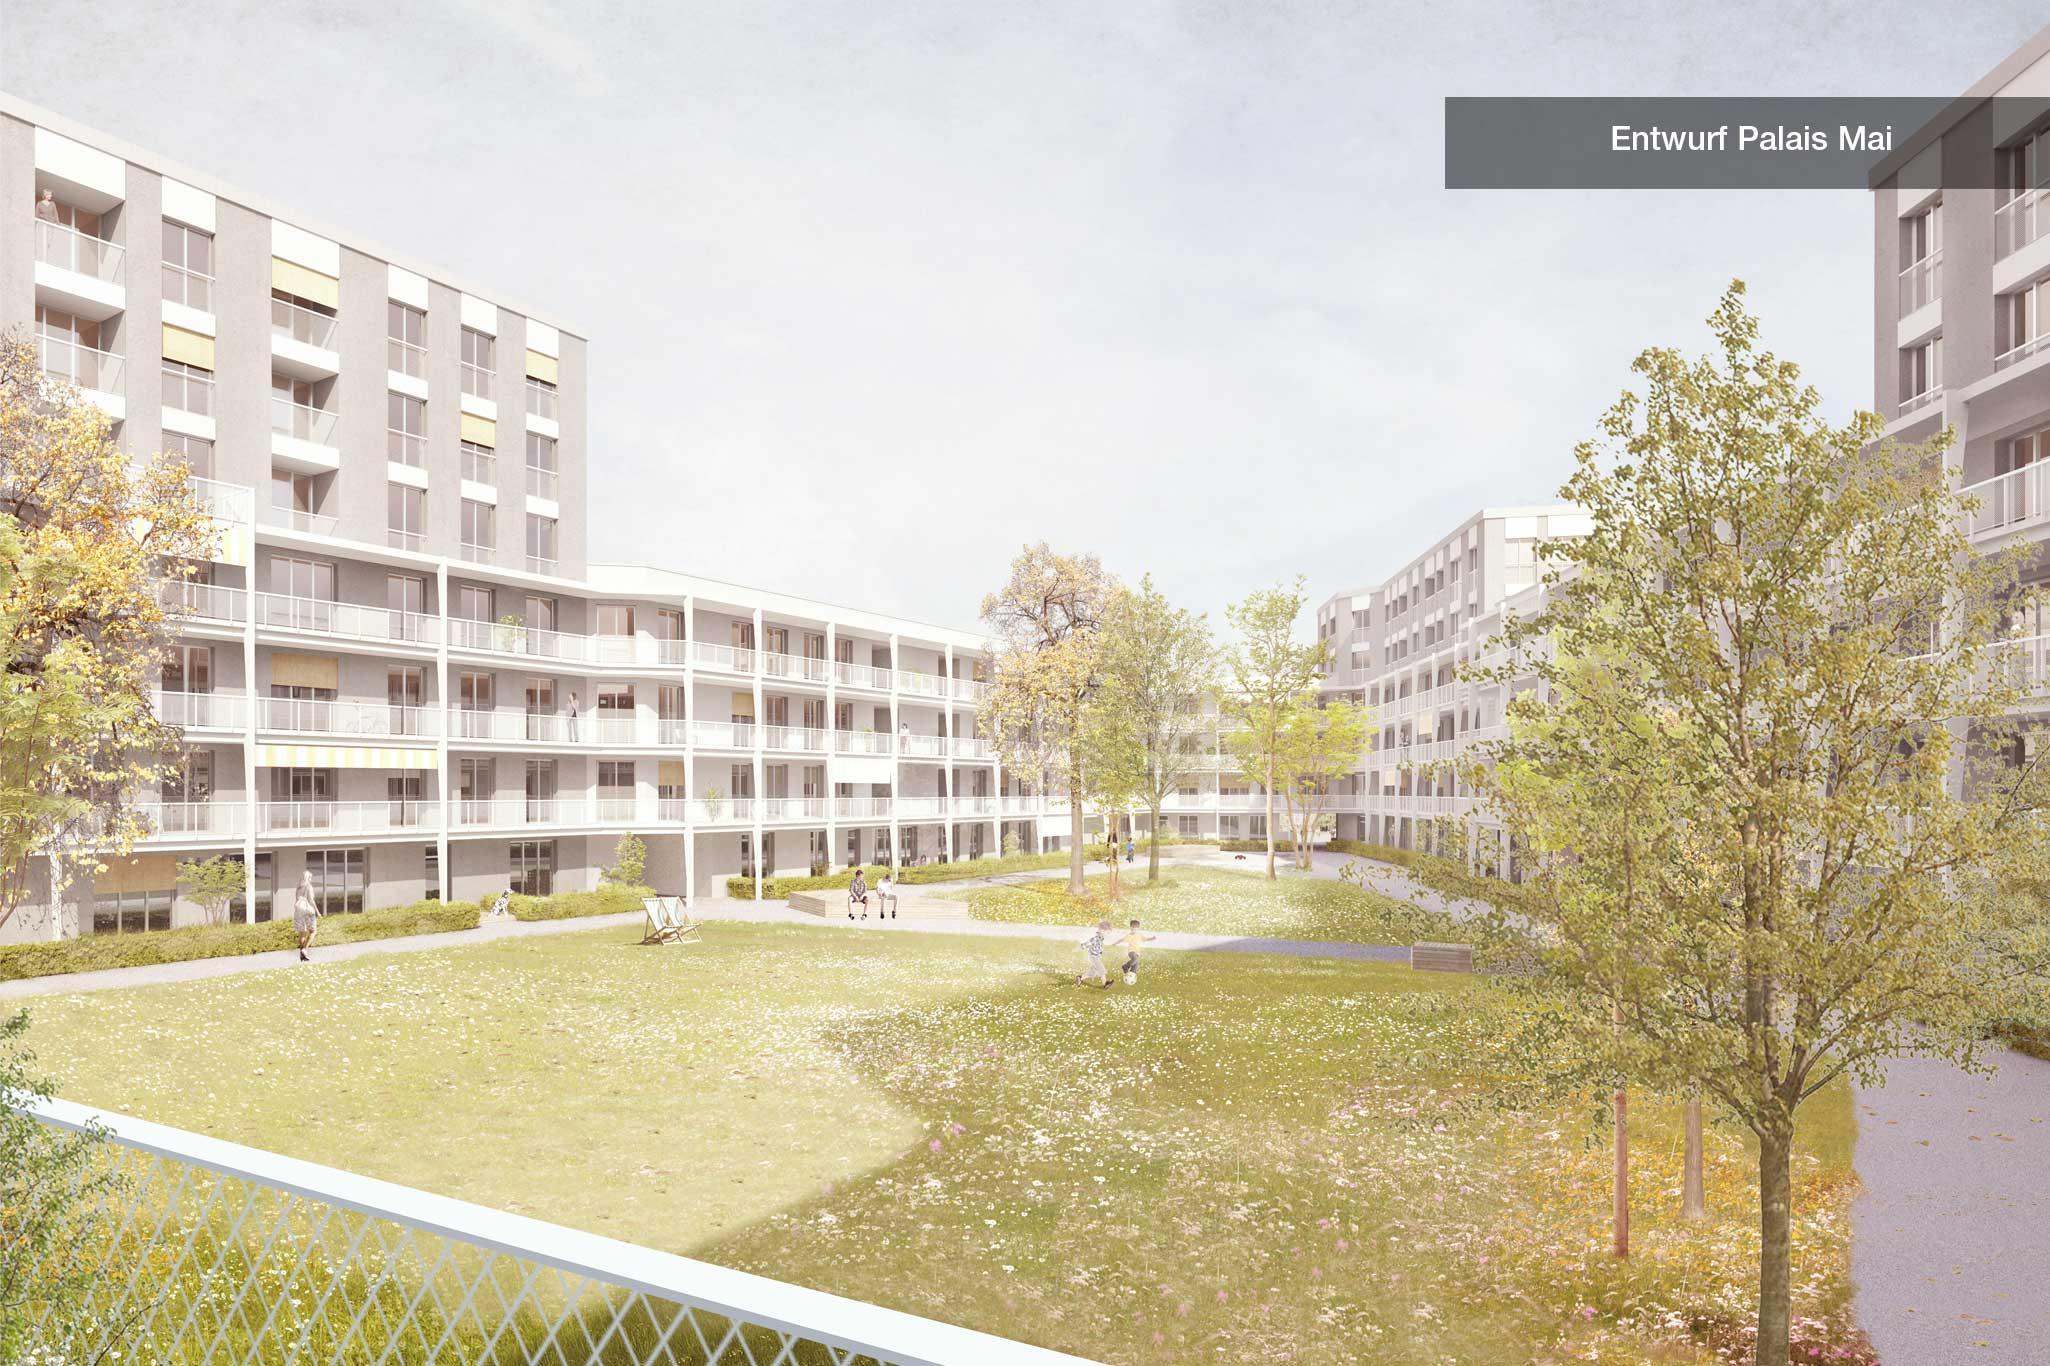 Entwurf Palaismai Innenhof